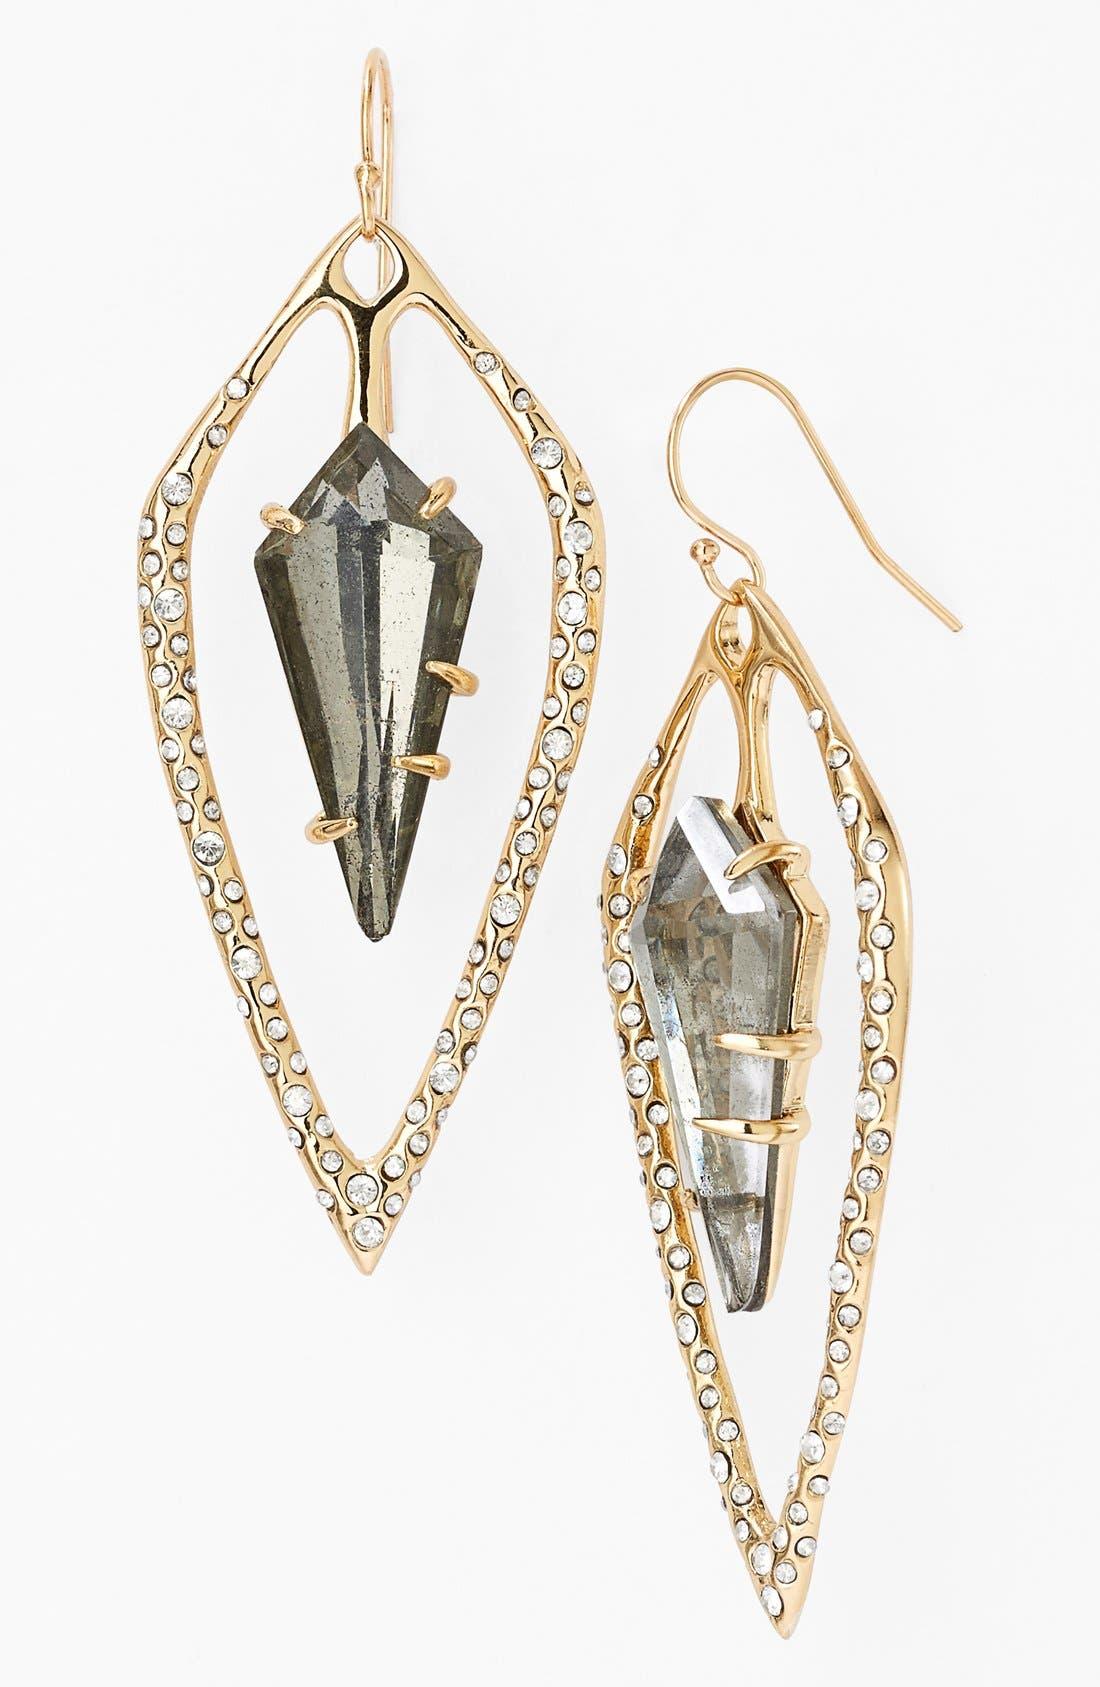 Alternate Image 1 Selected - Alexis Bittar 'Miss Havisham - Kinetic Gold' Drop Earrings